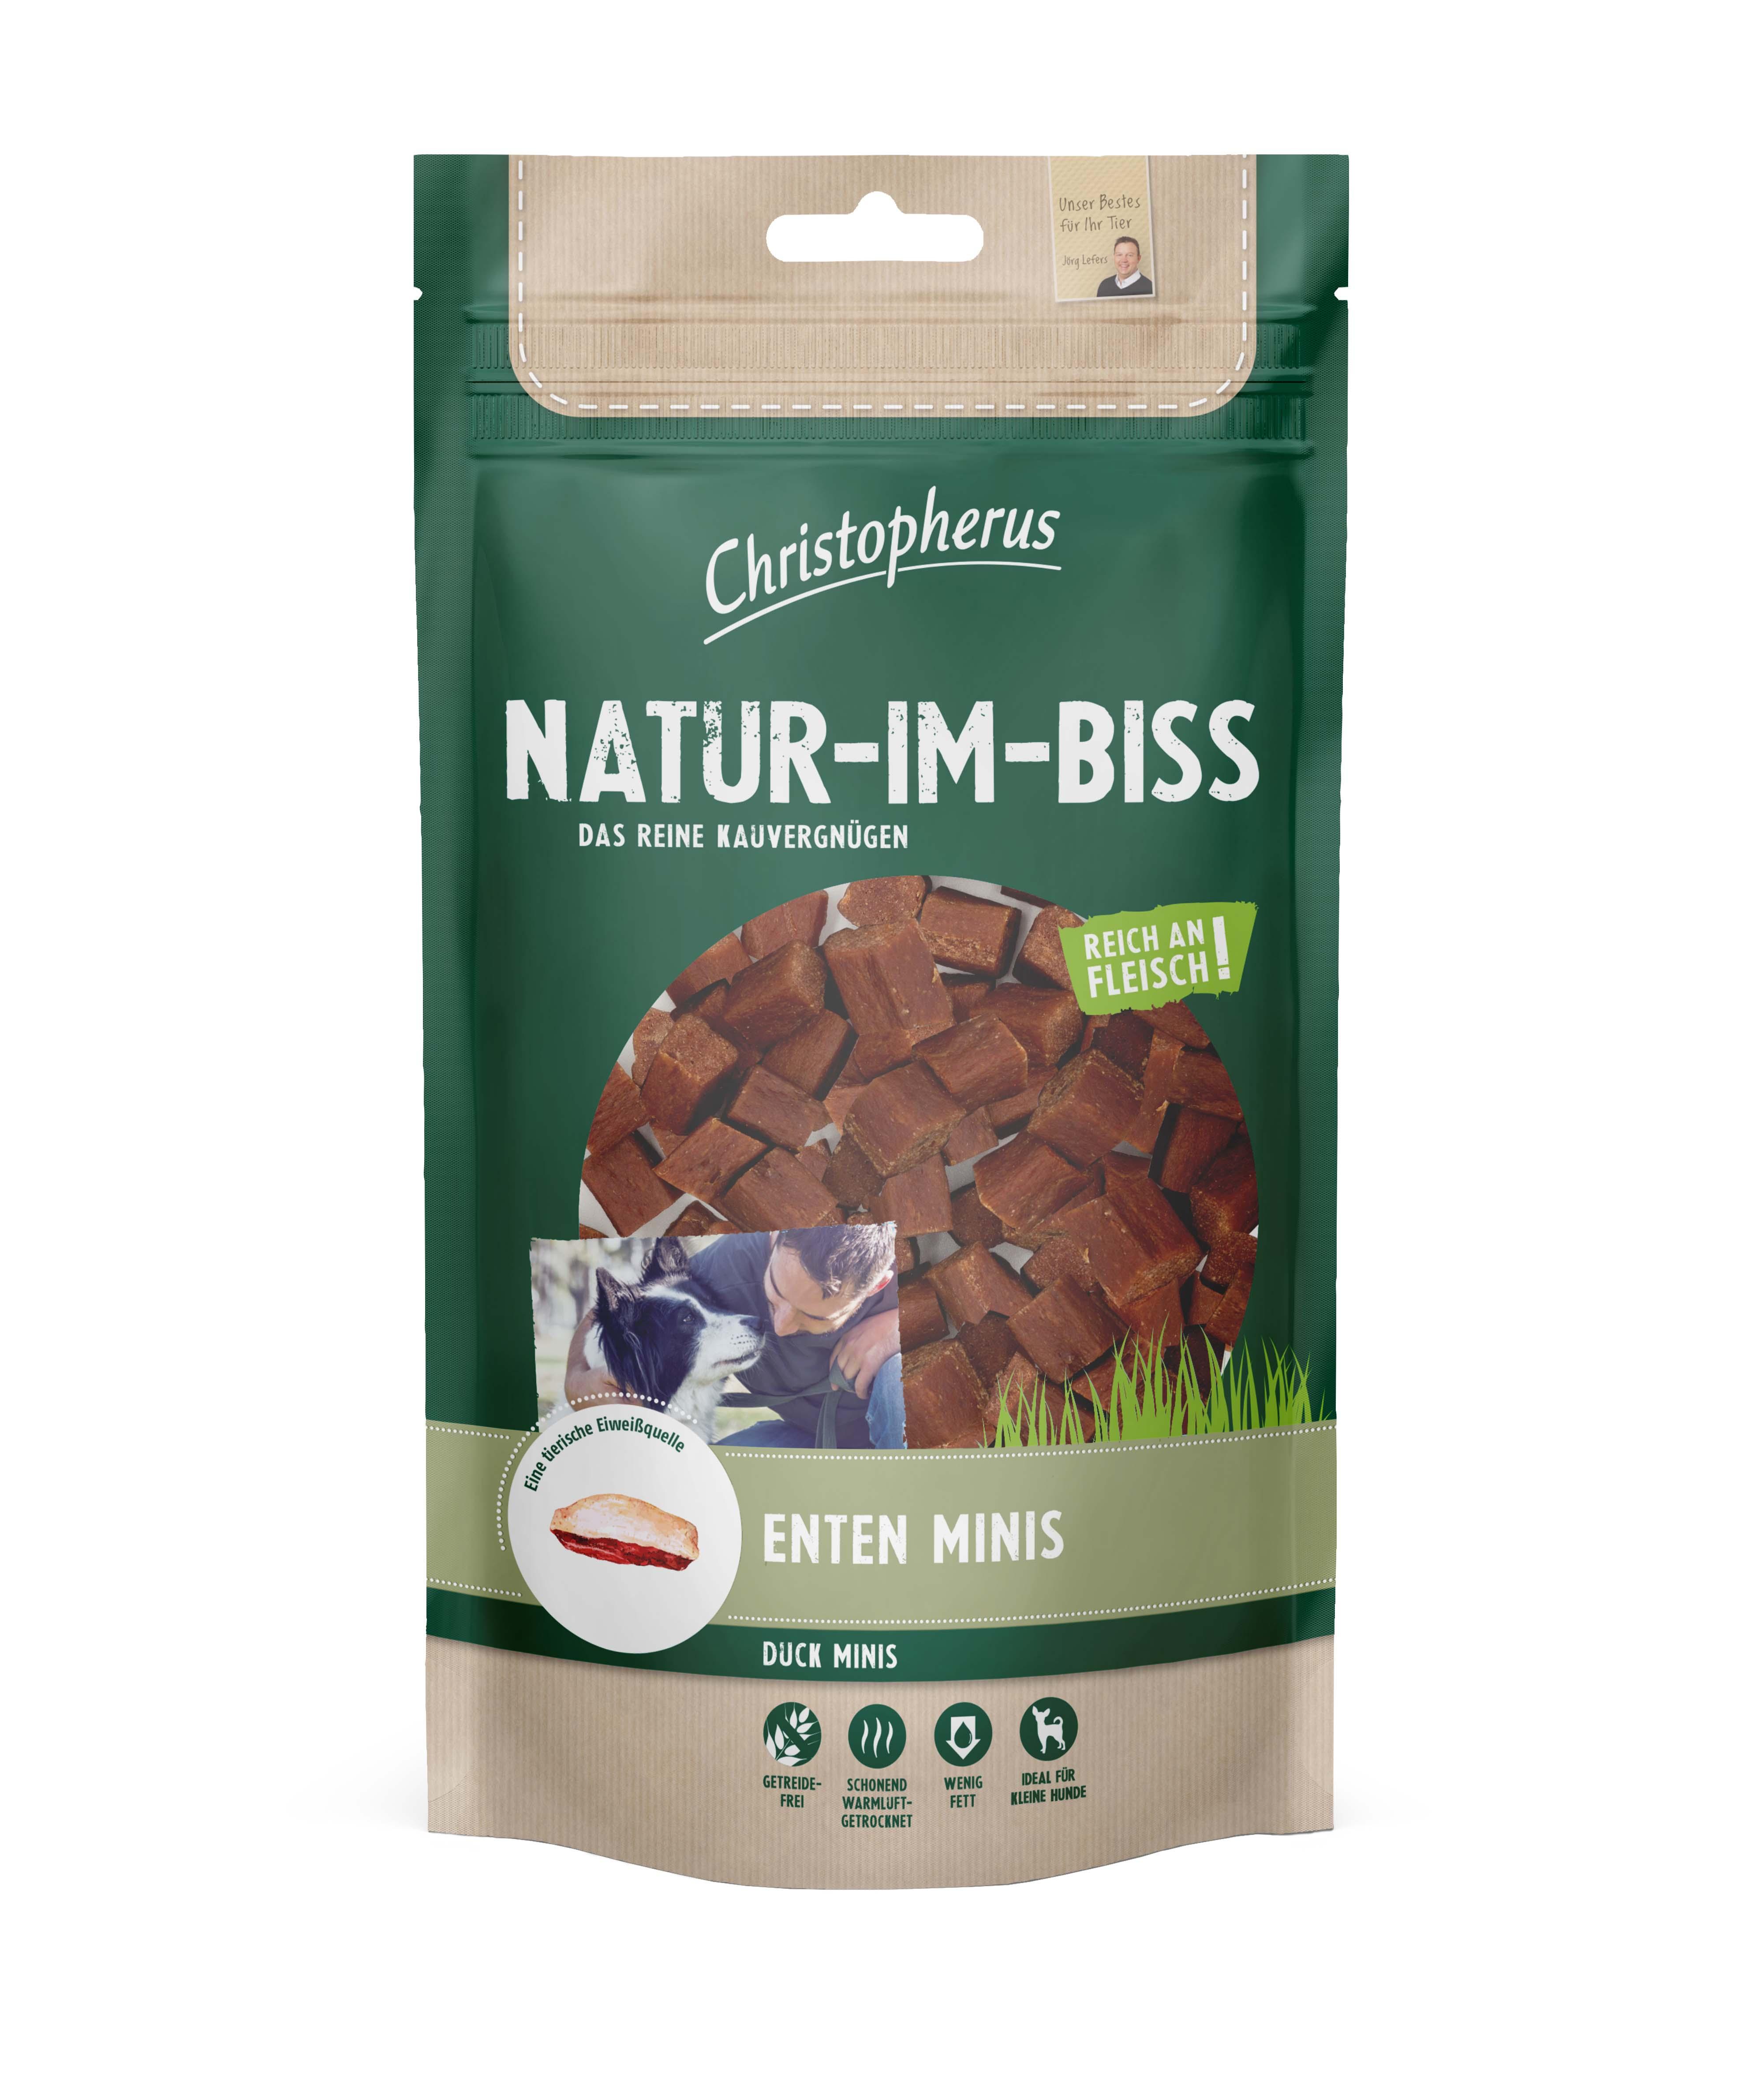 Christopherus - Natur-Im-Biss Enten Minis